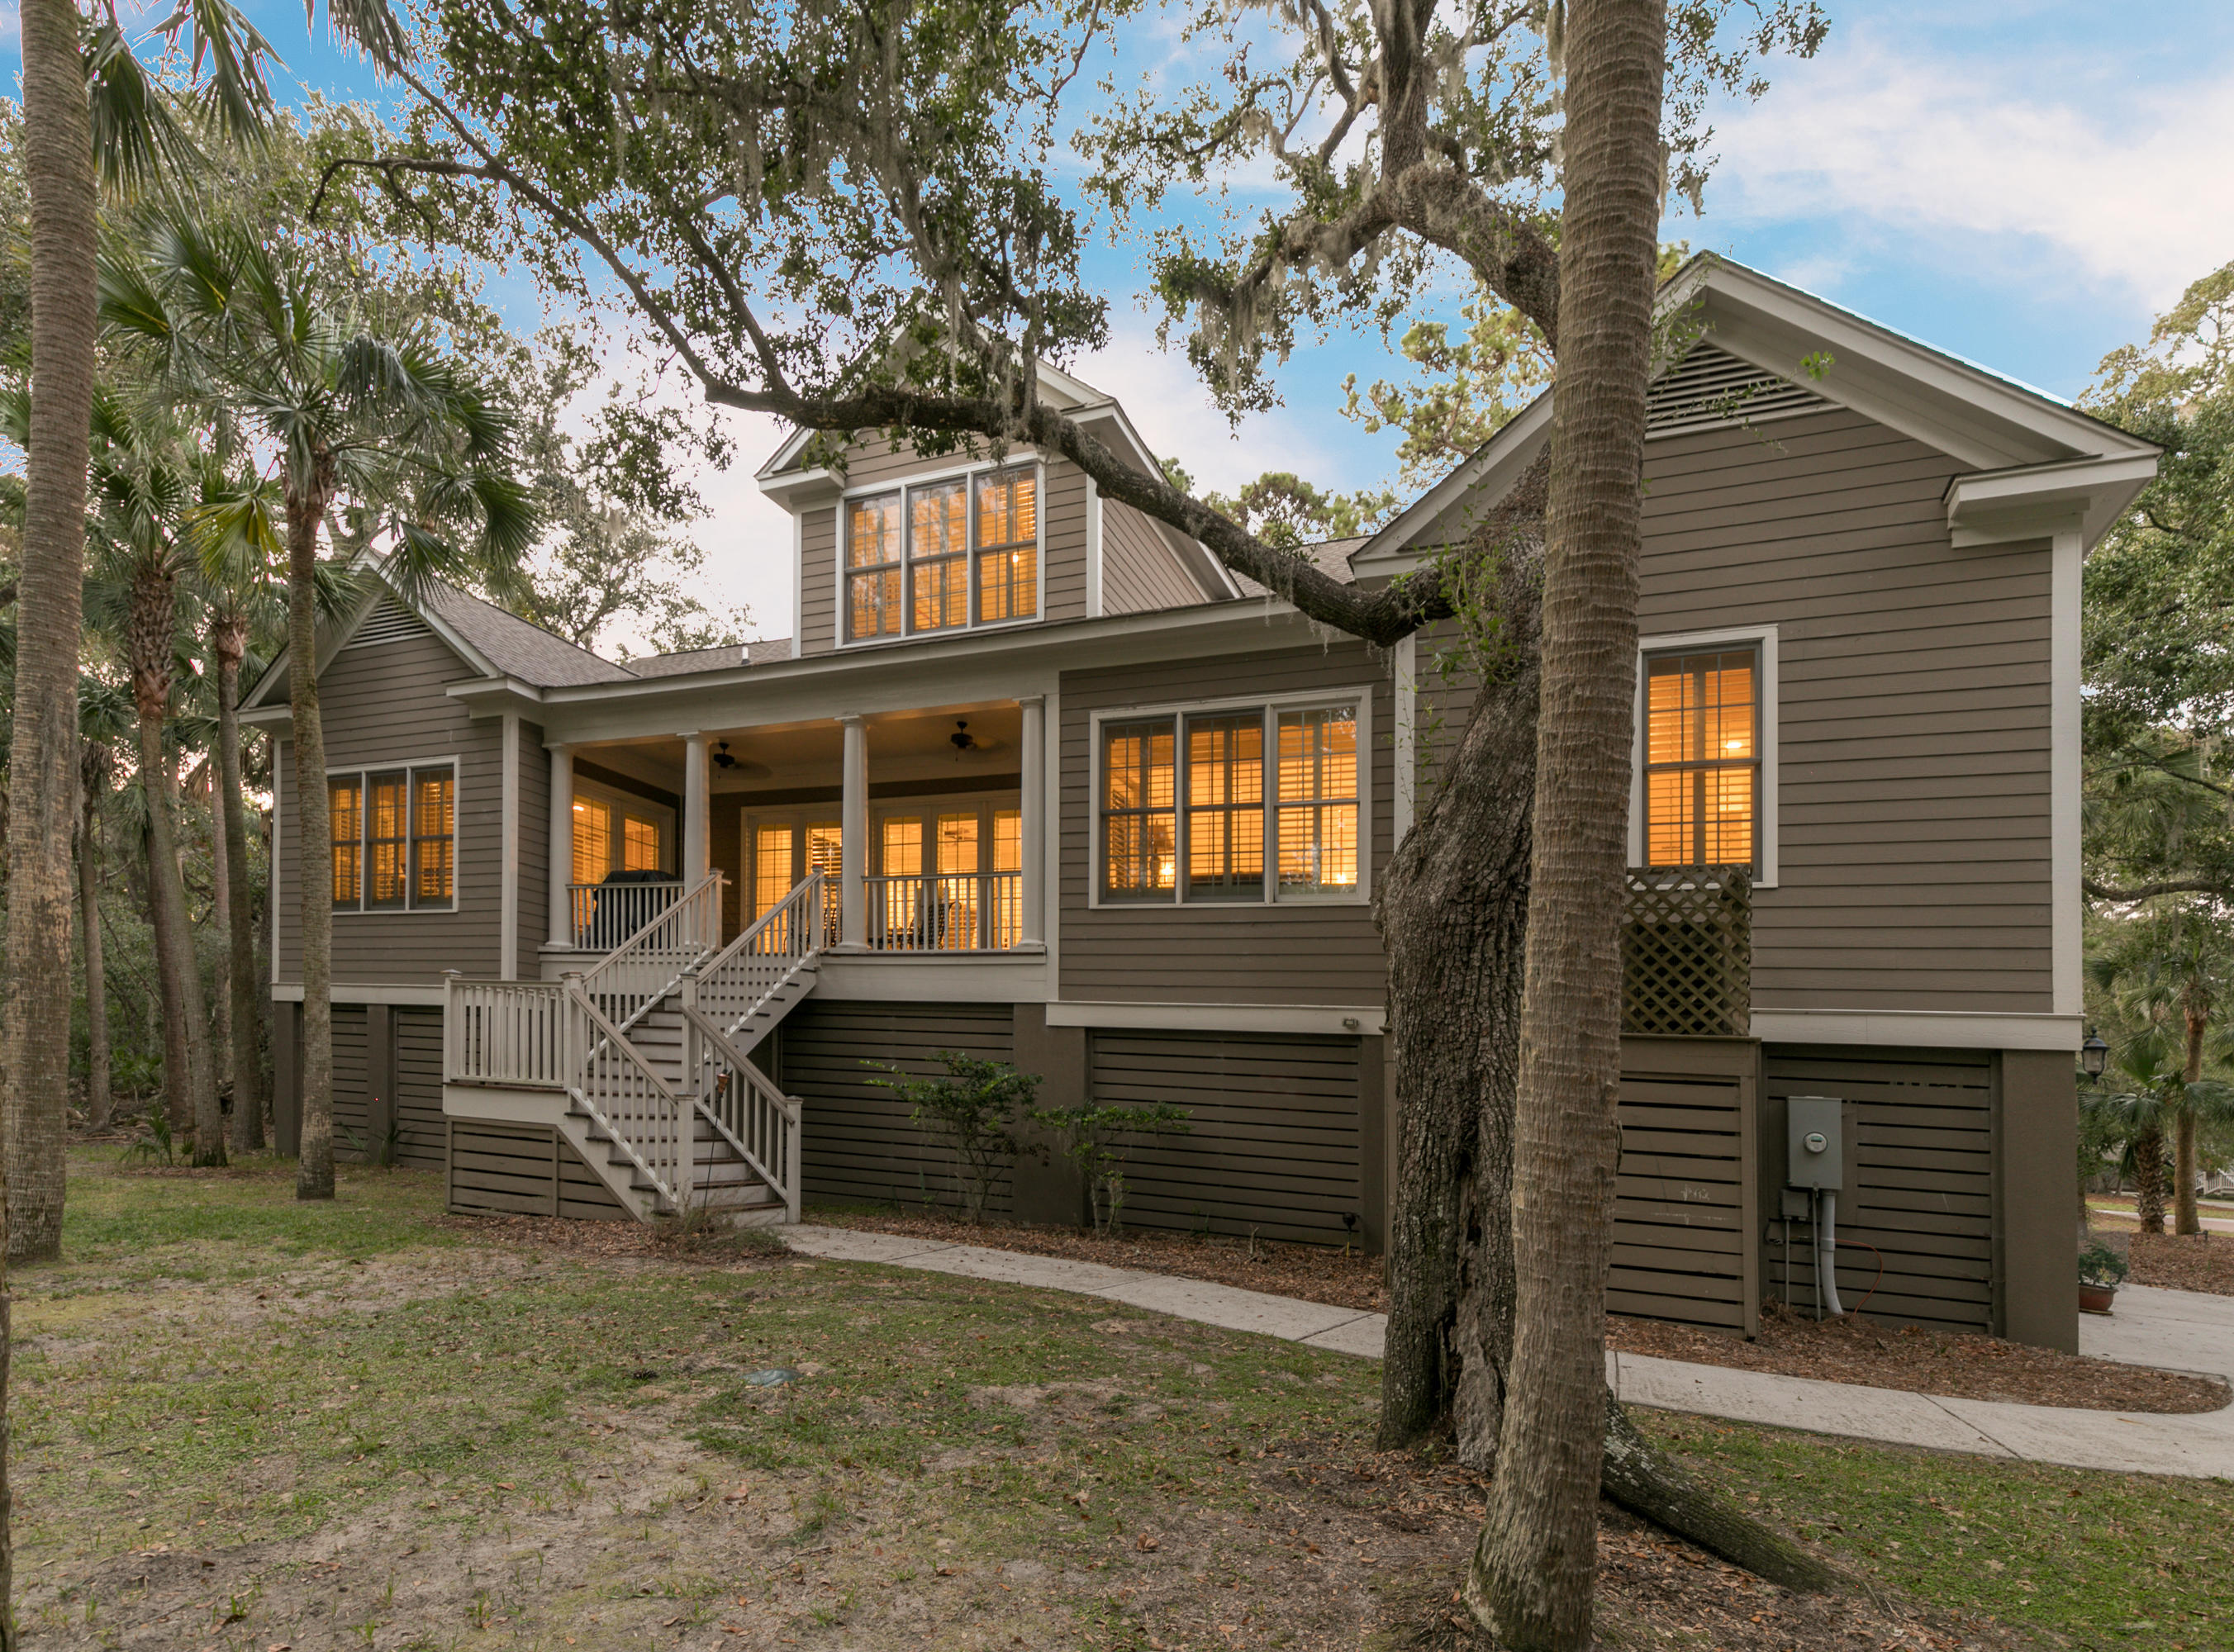 Seabrook Island Homes For Sale - 2701 Seabrook Island, Seabrook Island, SC - 54